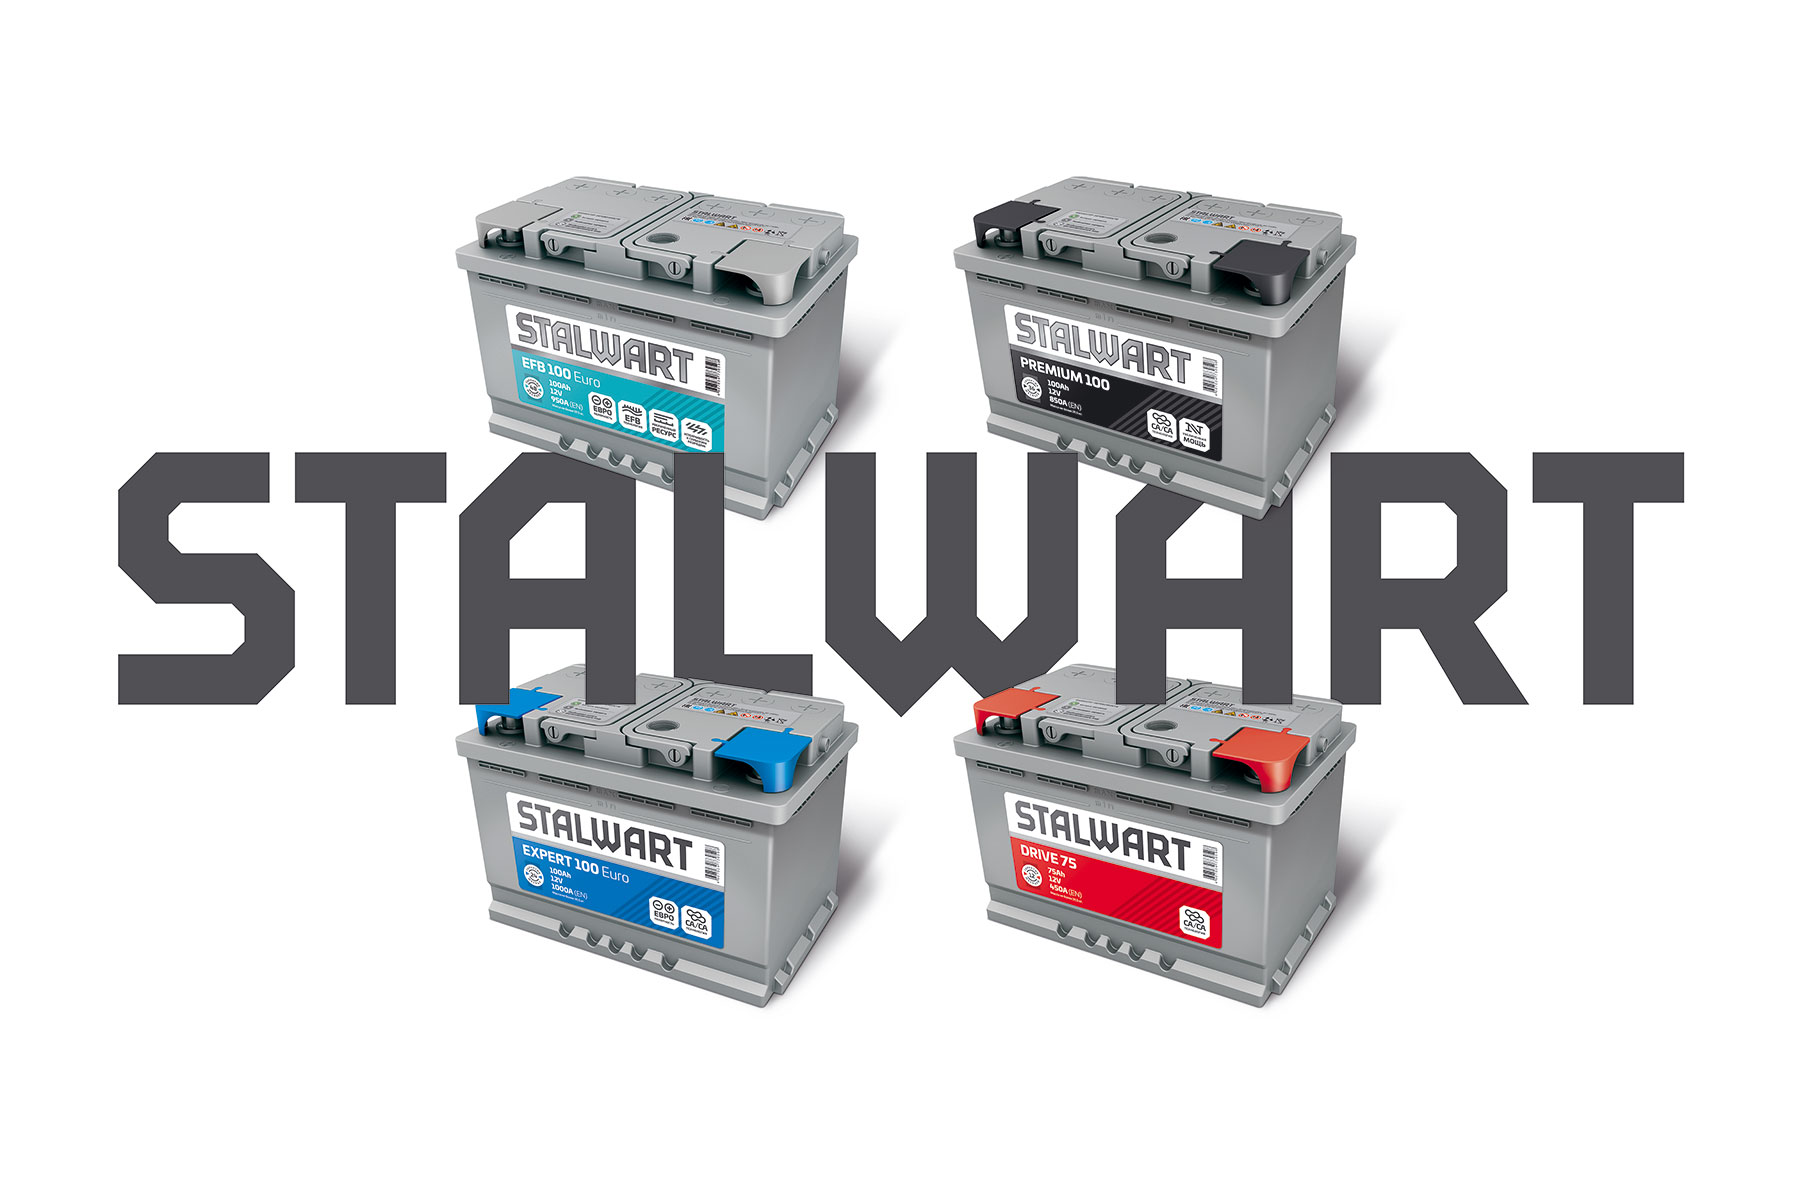 Stalwart-03.jpg